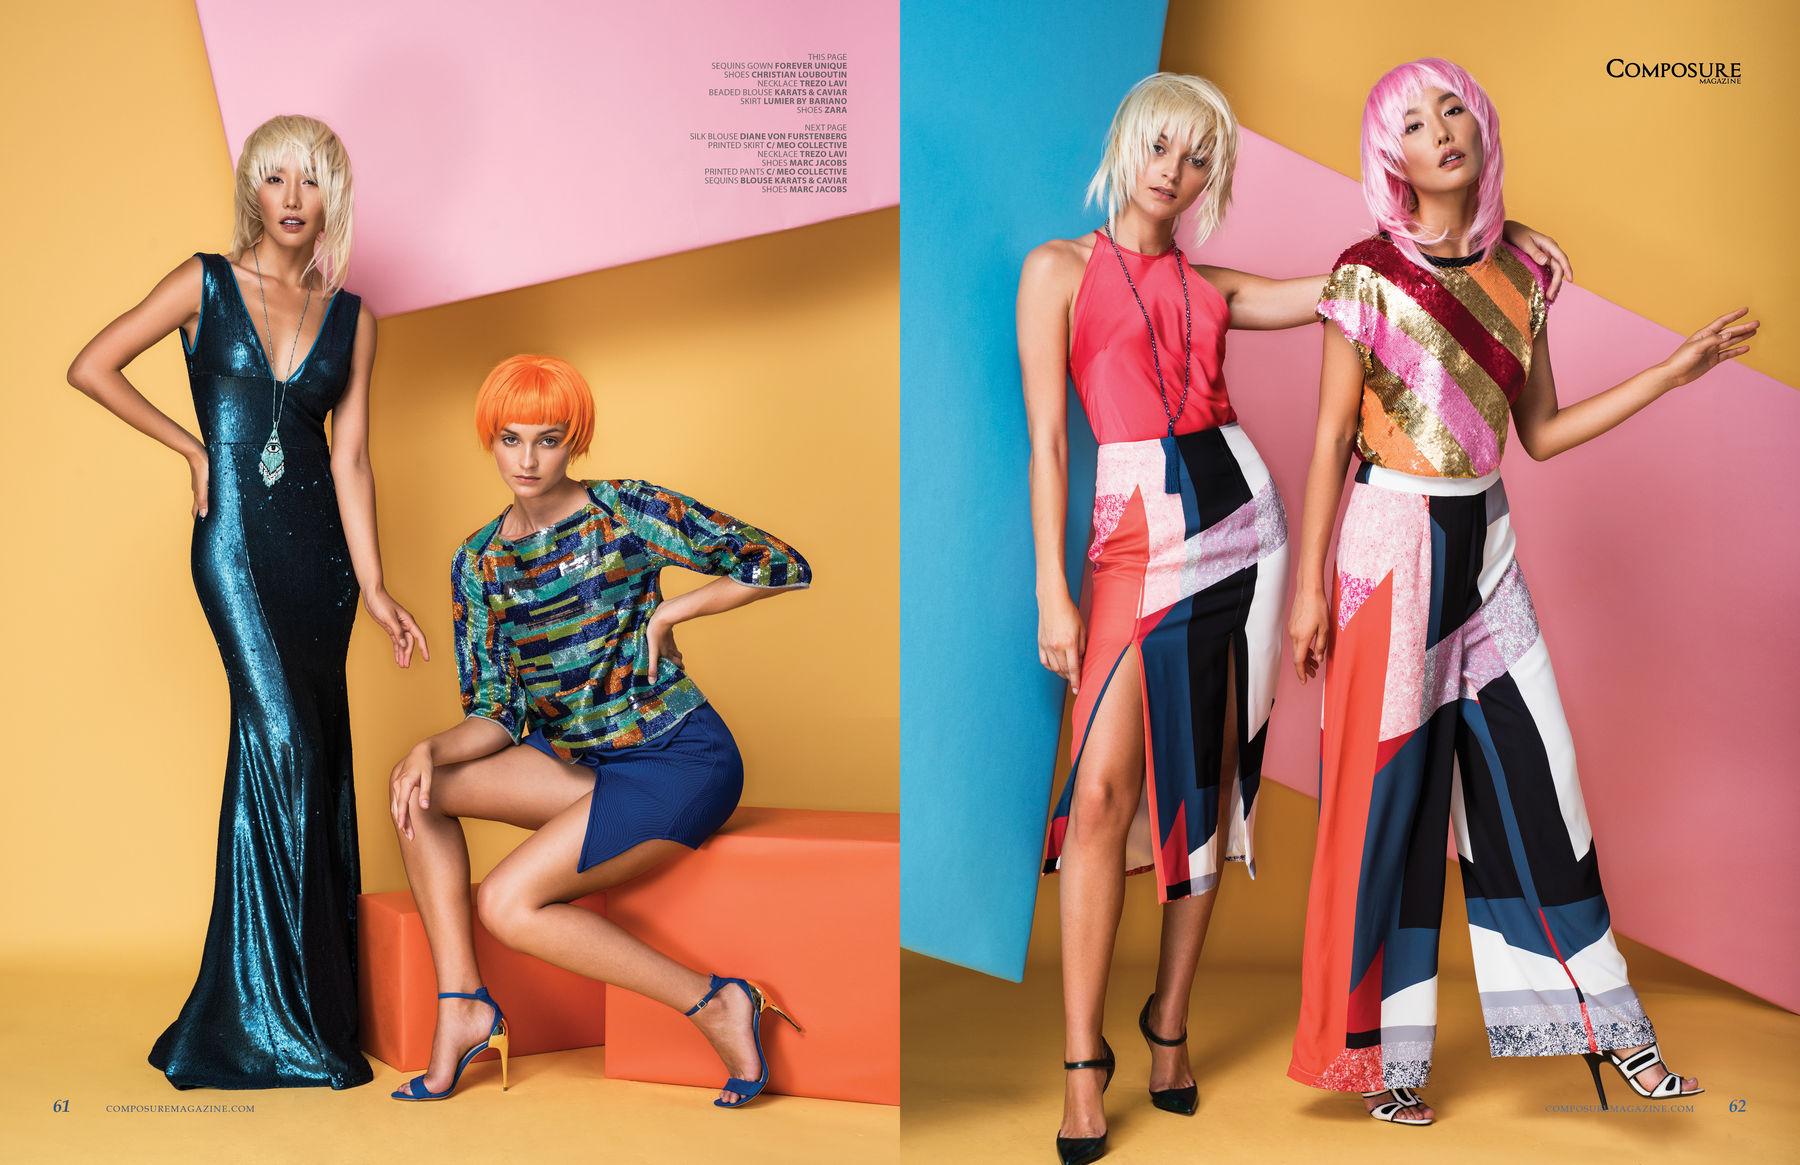 Fashion Editorial: Block Party – Composure Magazine